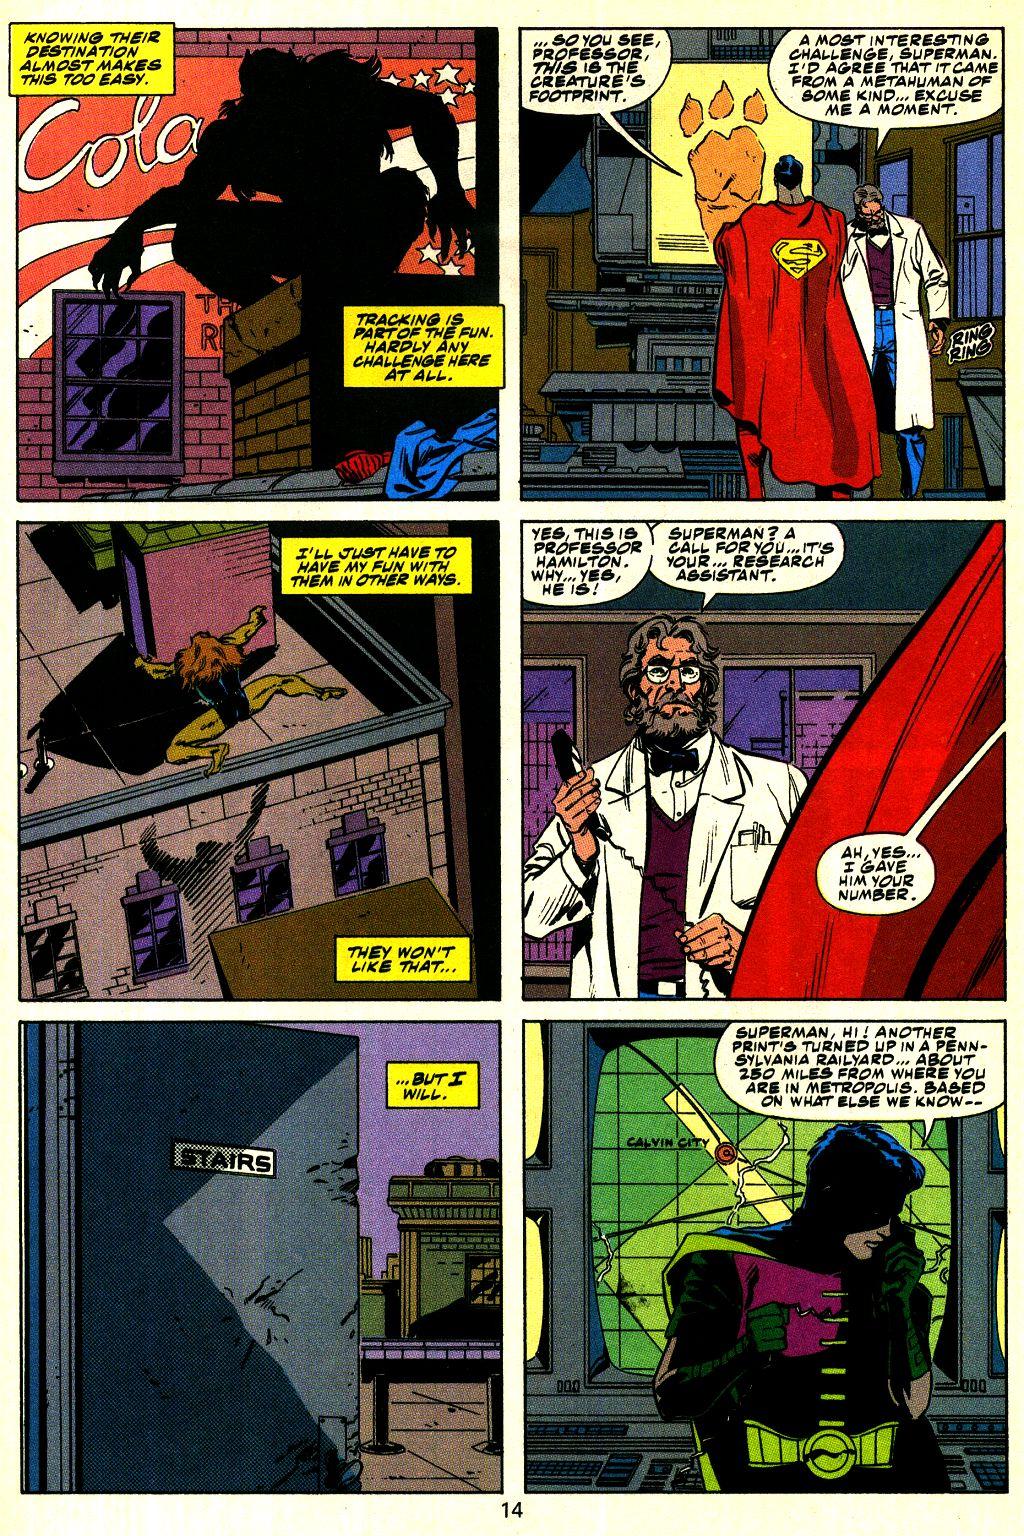 Action Comics (1938) 683 Page 14